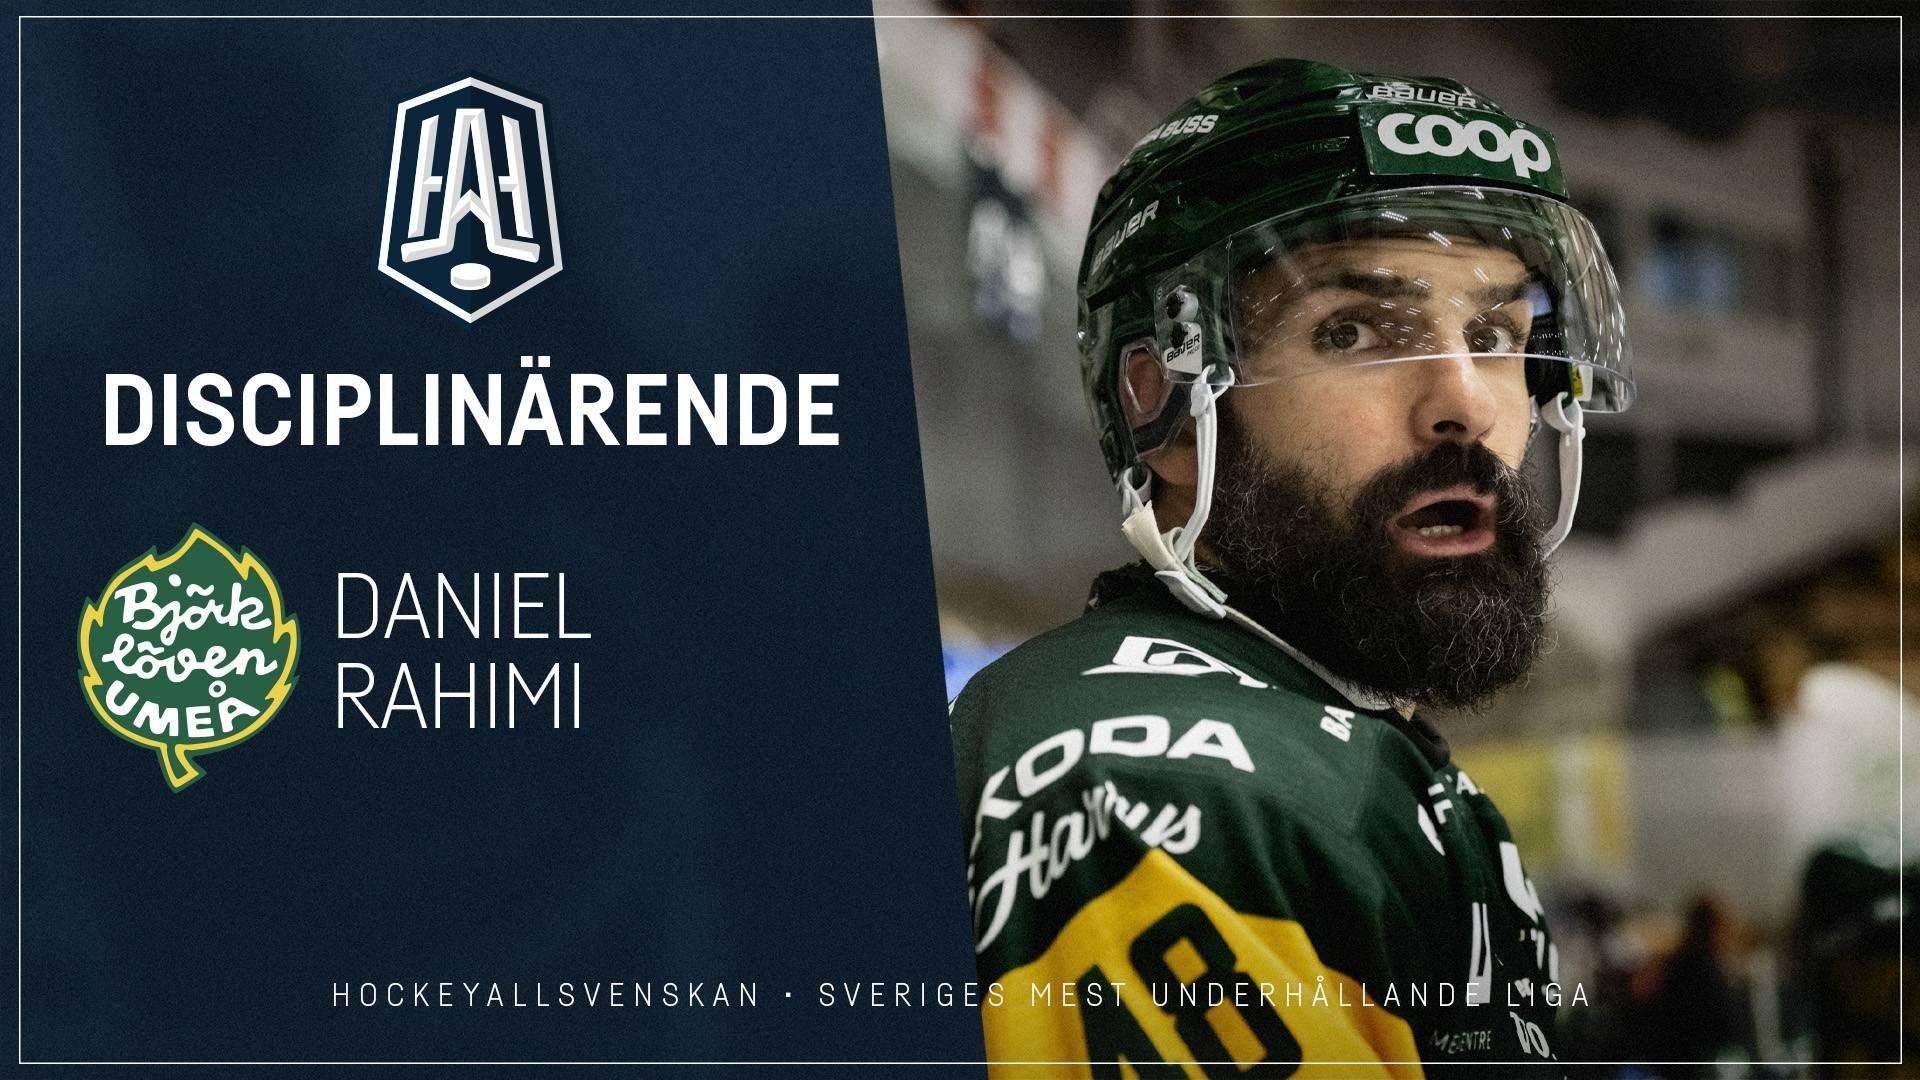 Disciplinärende: Daniel Rahimi, Björklöven